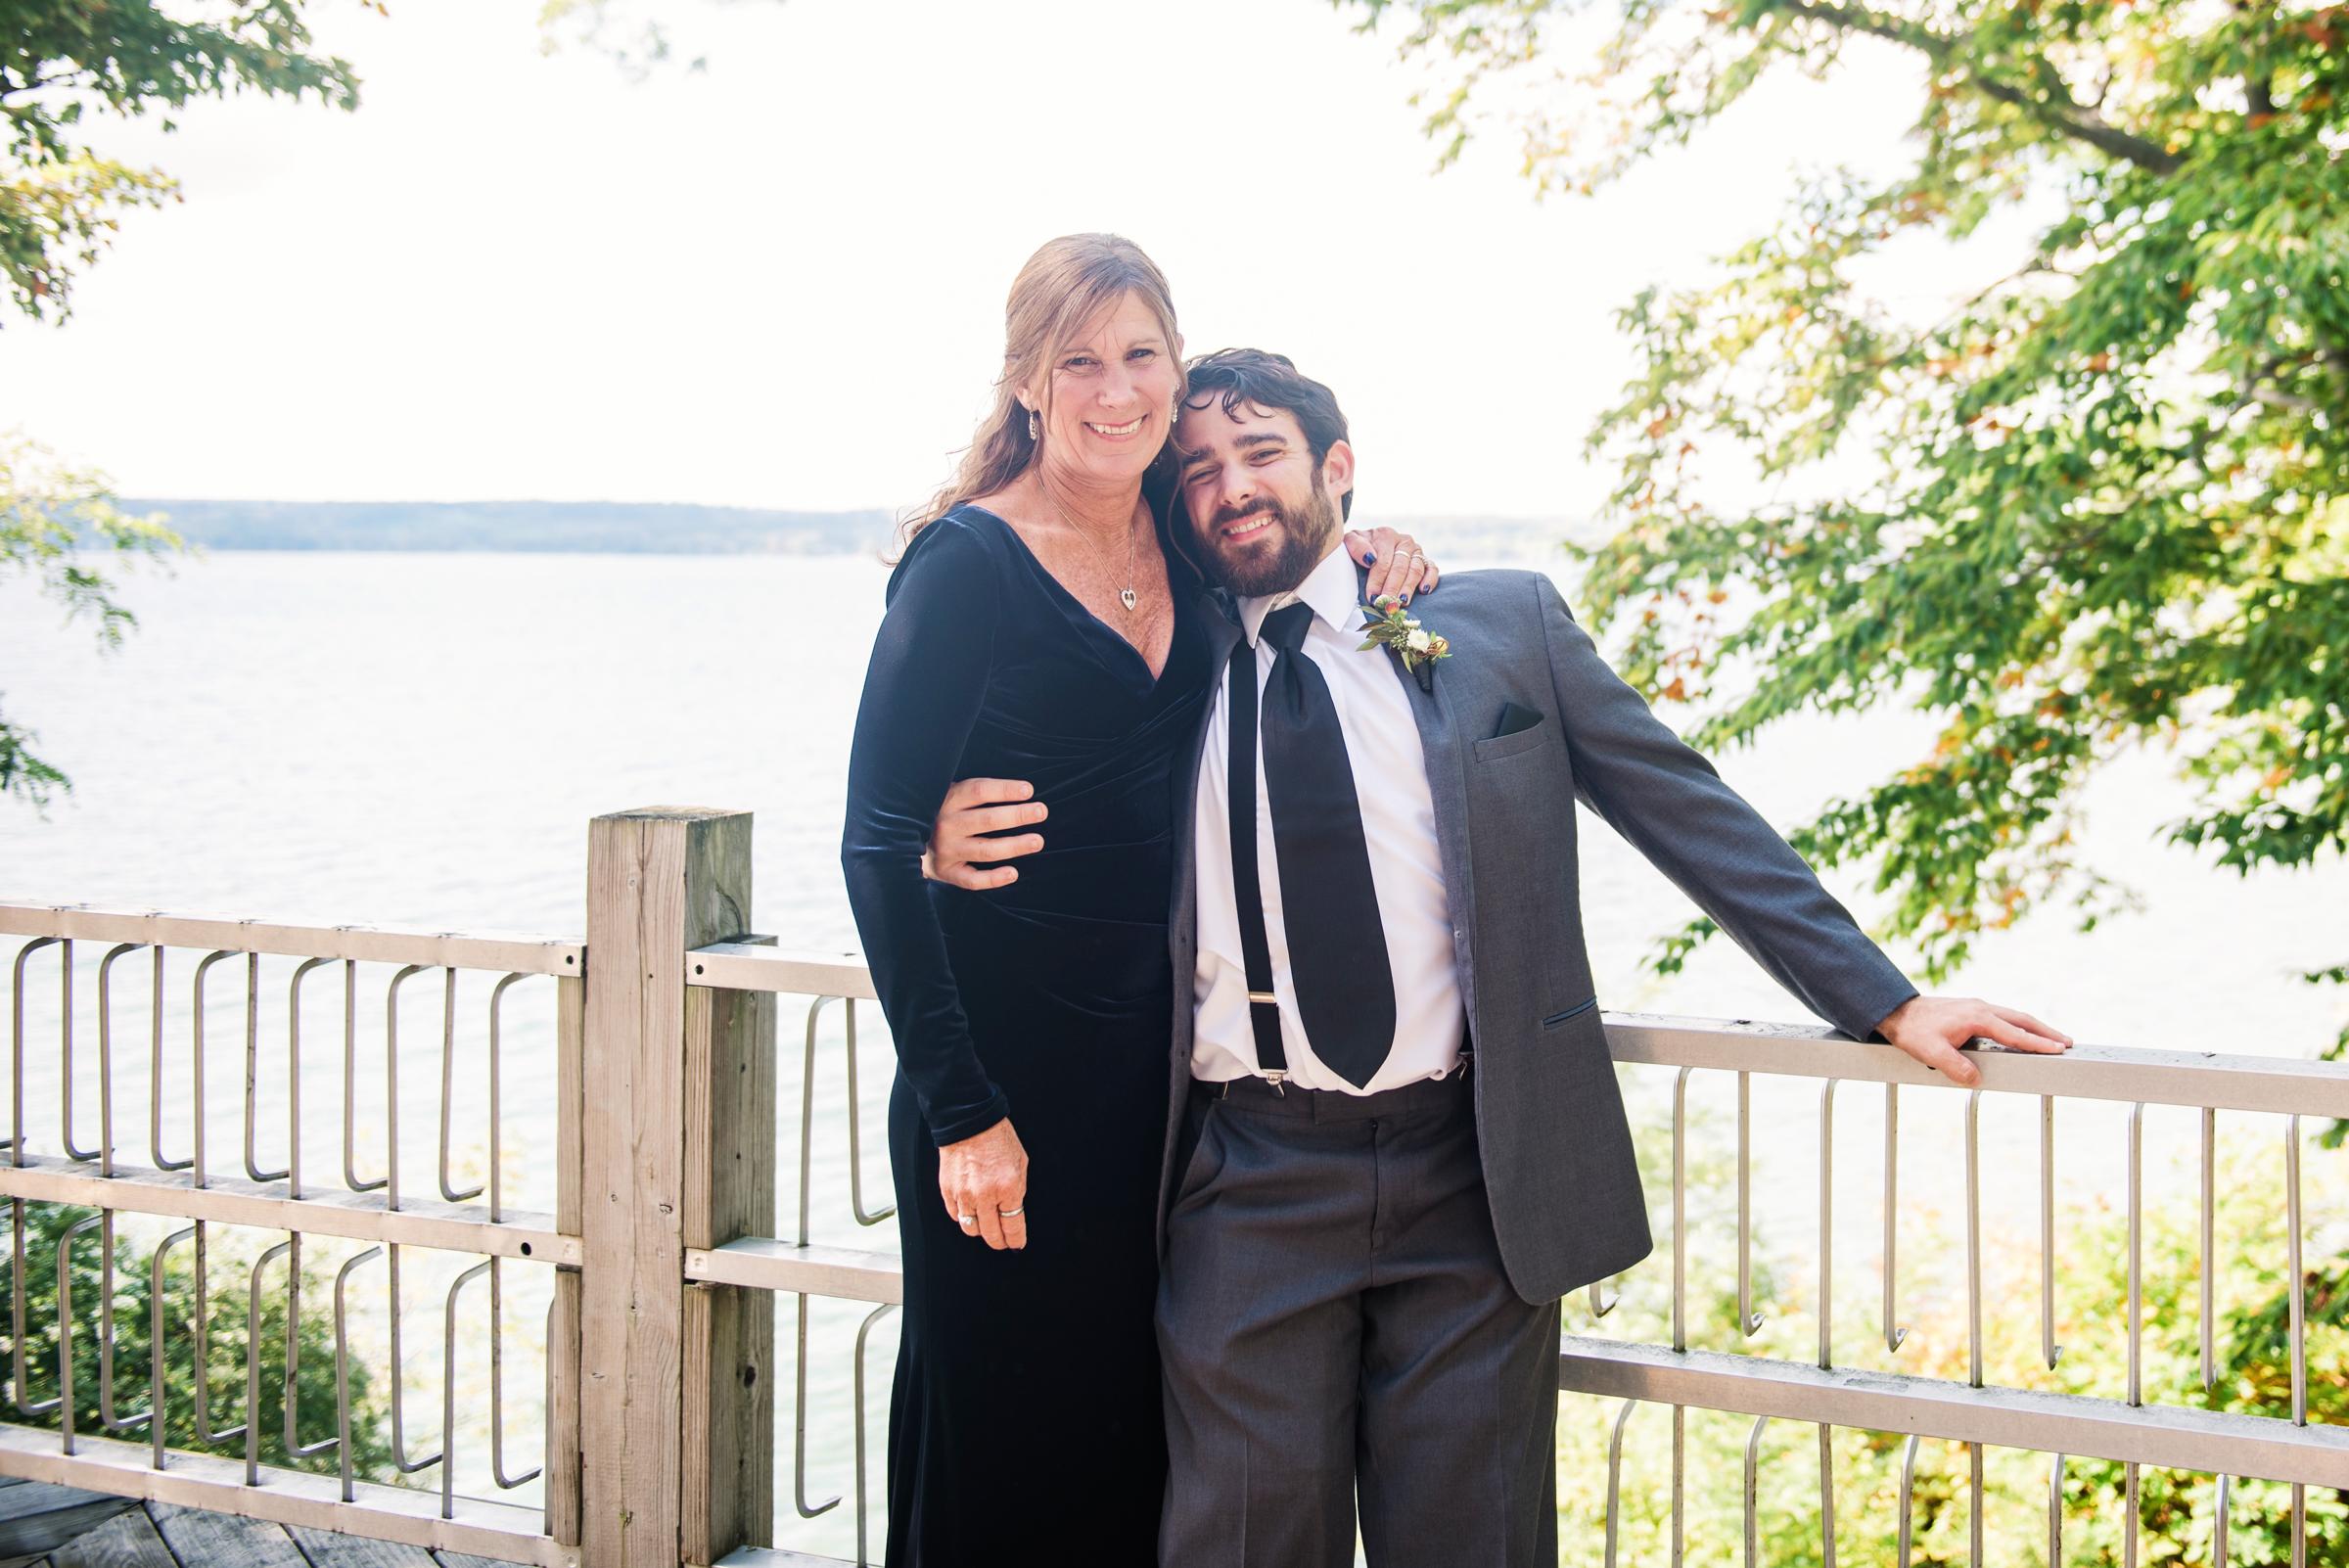 Zugibe_Vineyards_Finger_Lakes_Wedding_JILL_STUDIO_Rochester_NY_Photographer_DSC_3414.jpg